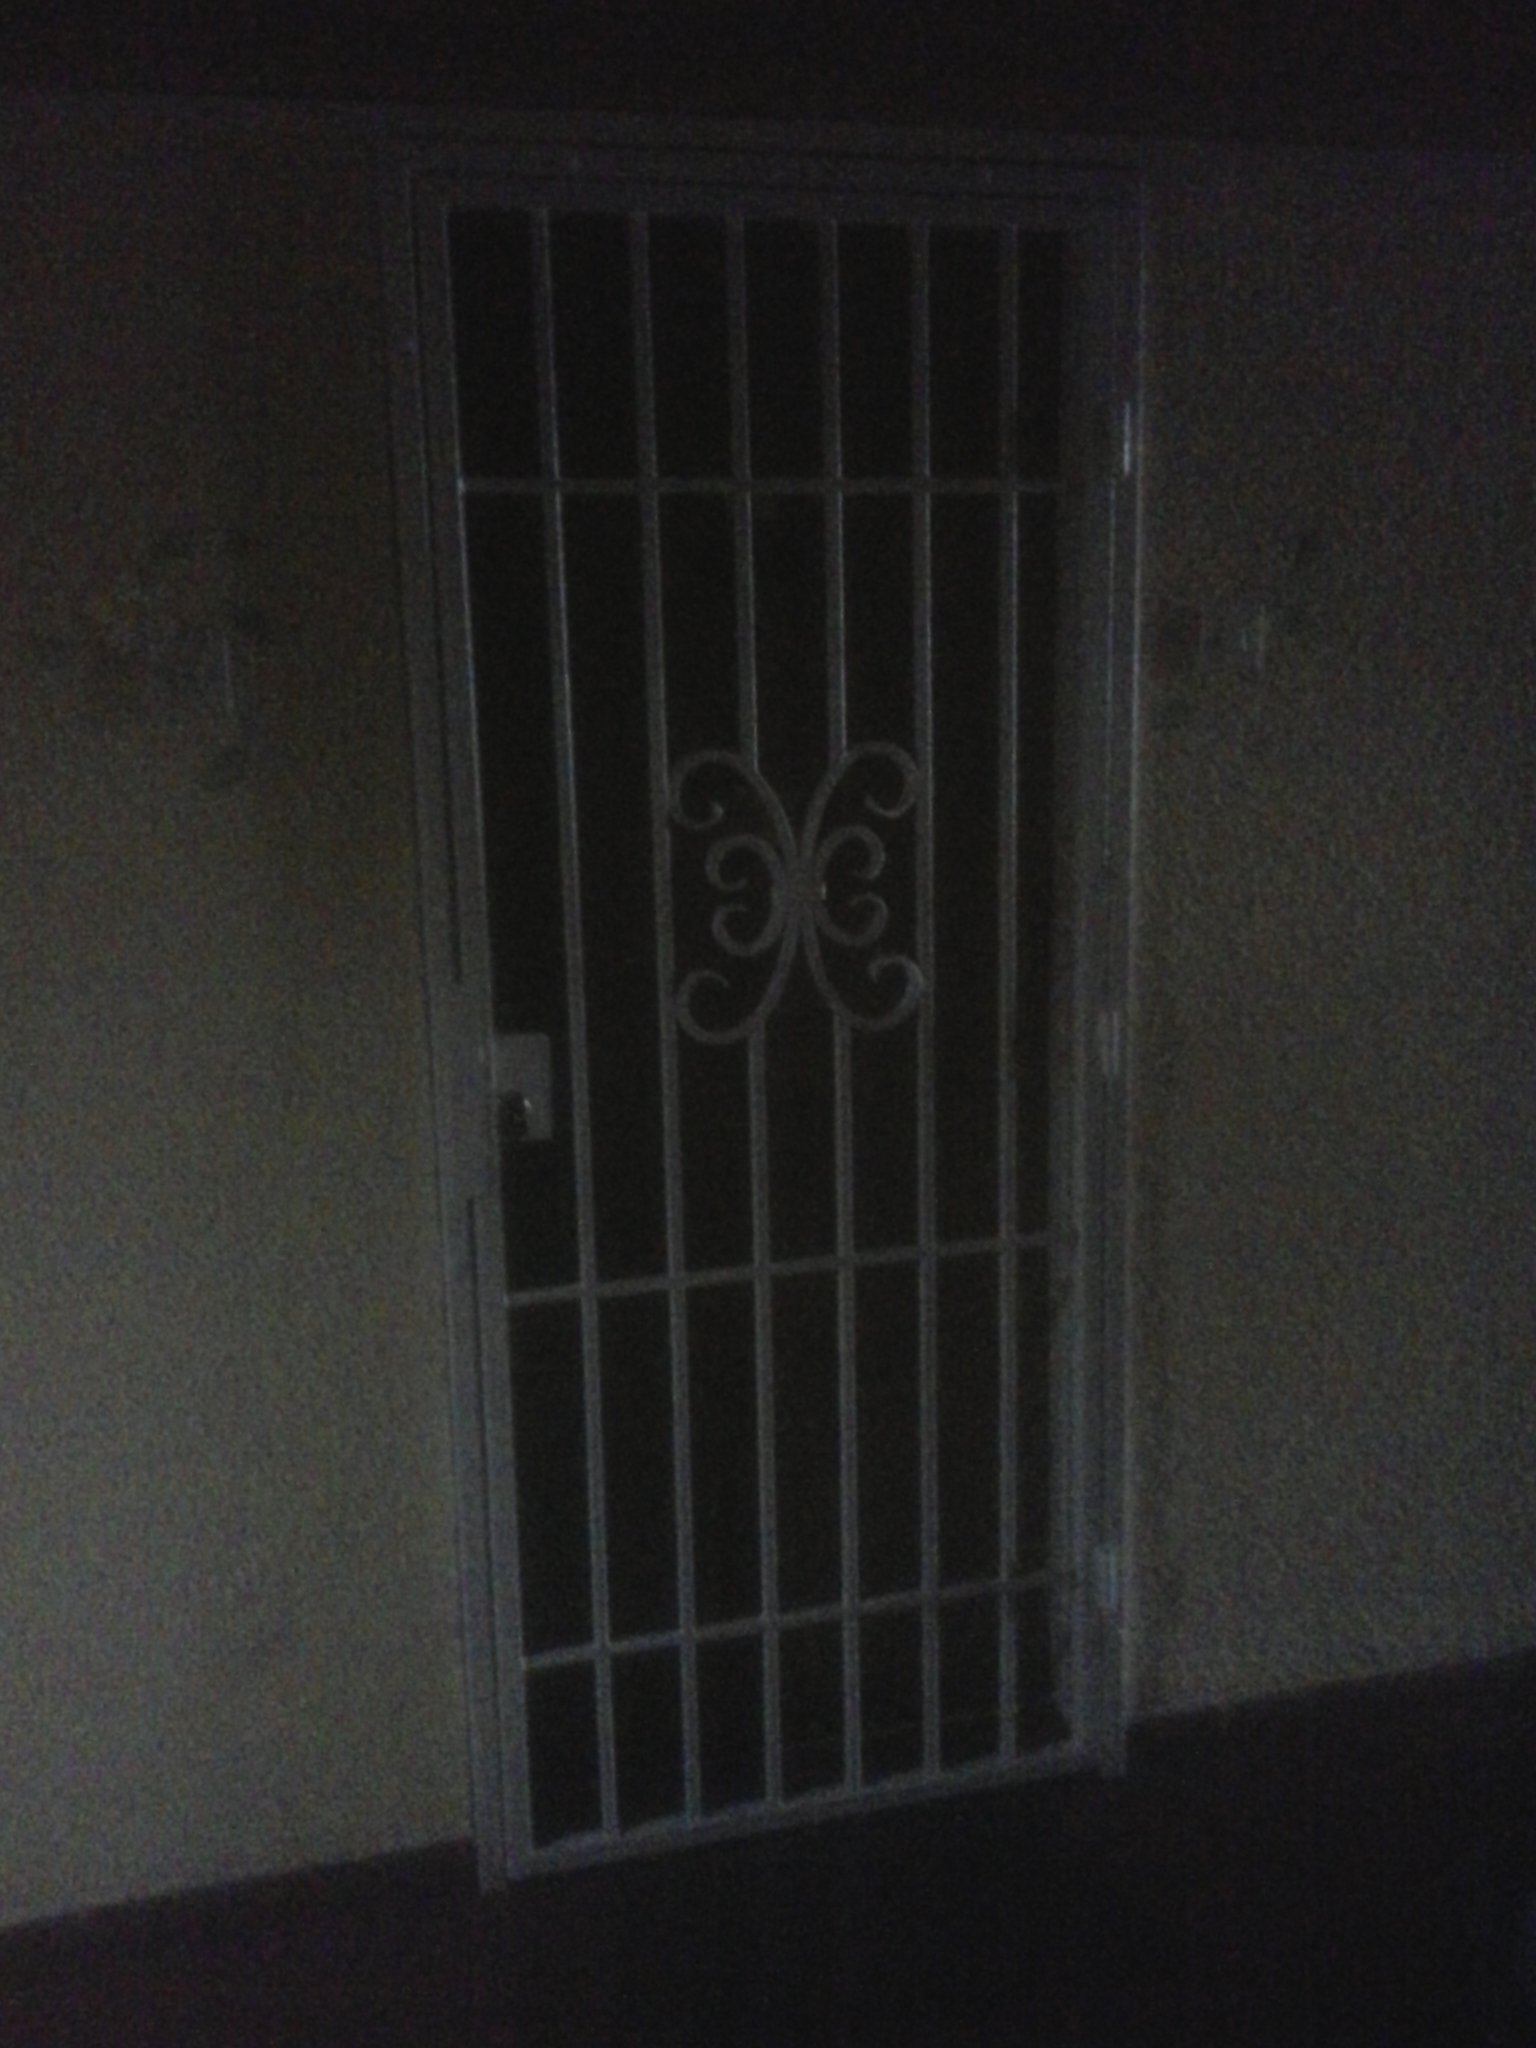 Rešetka na vratima